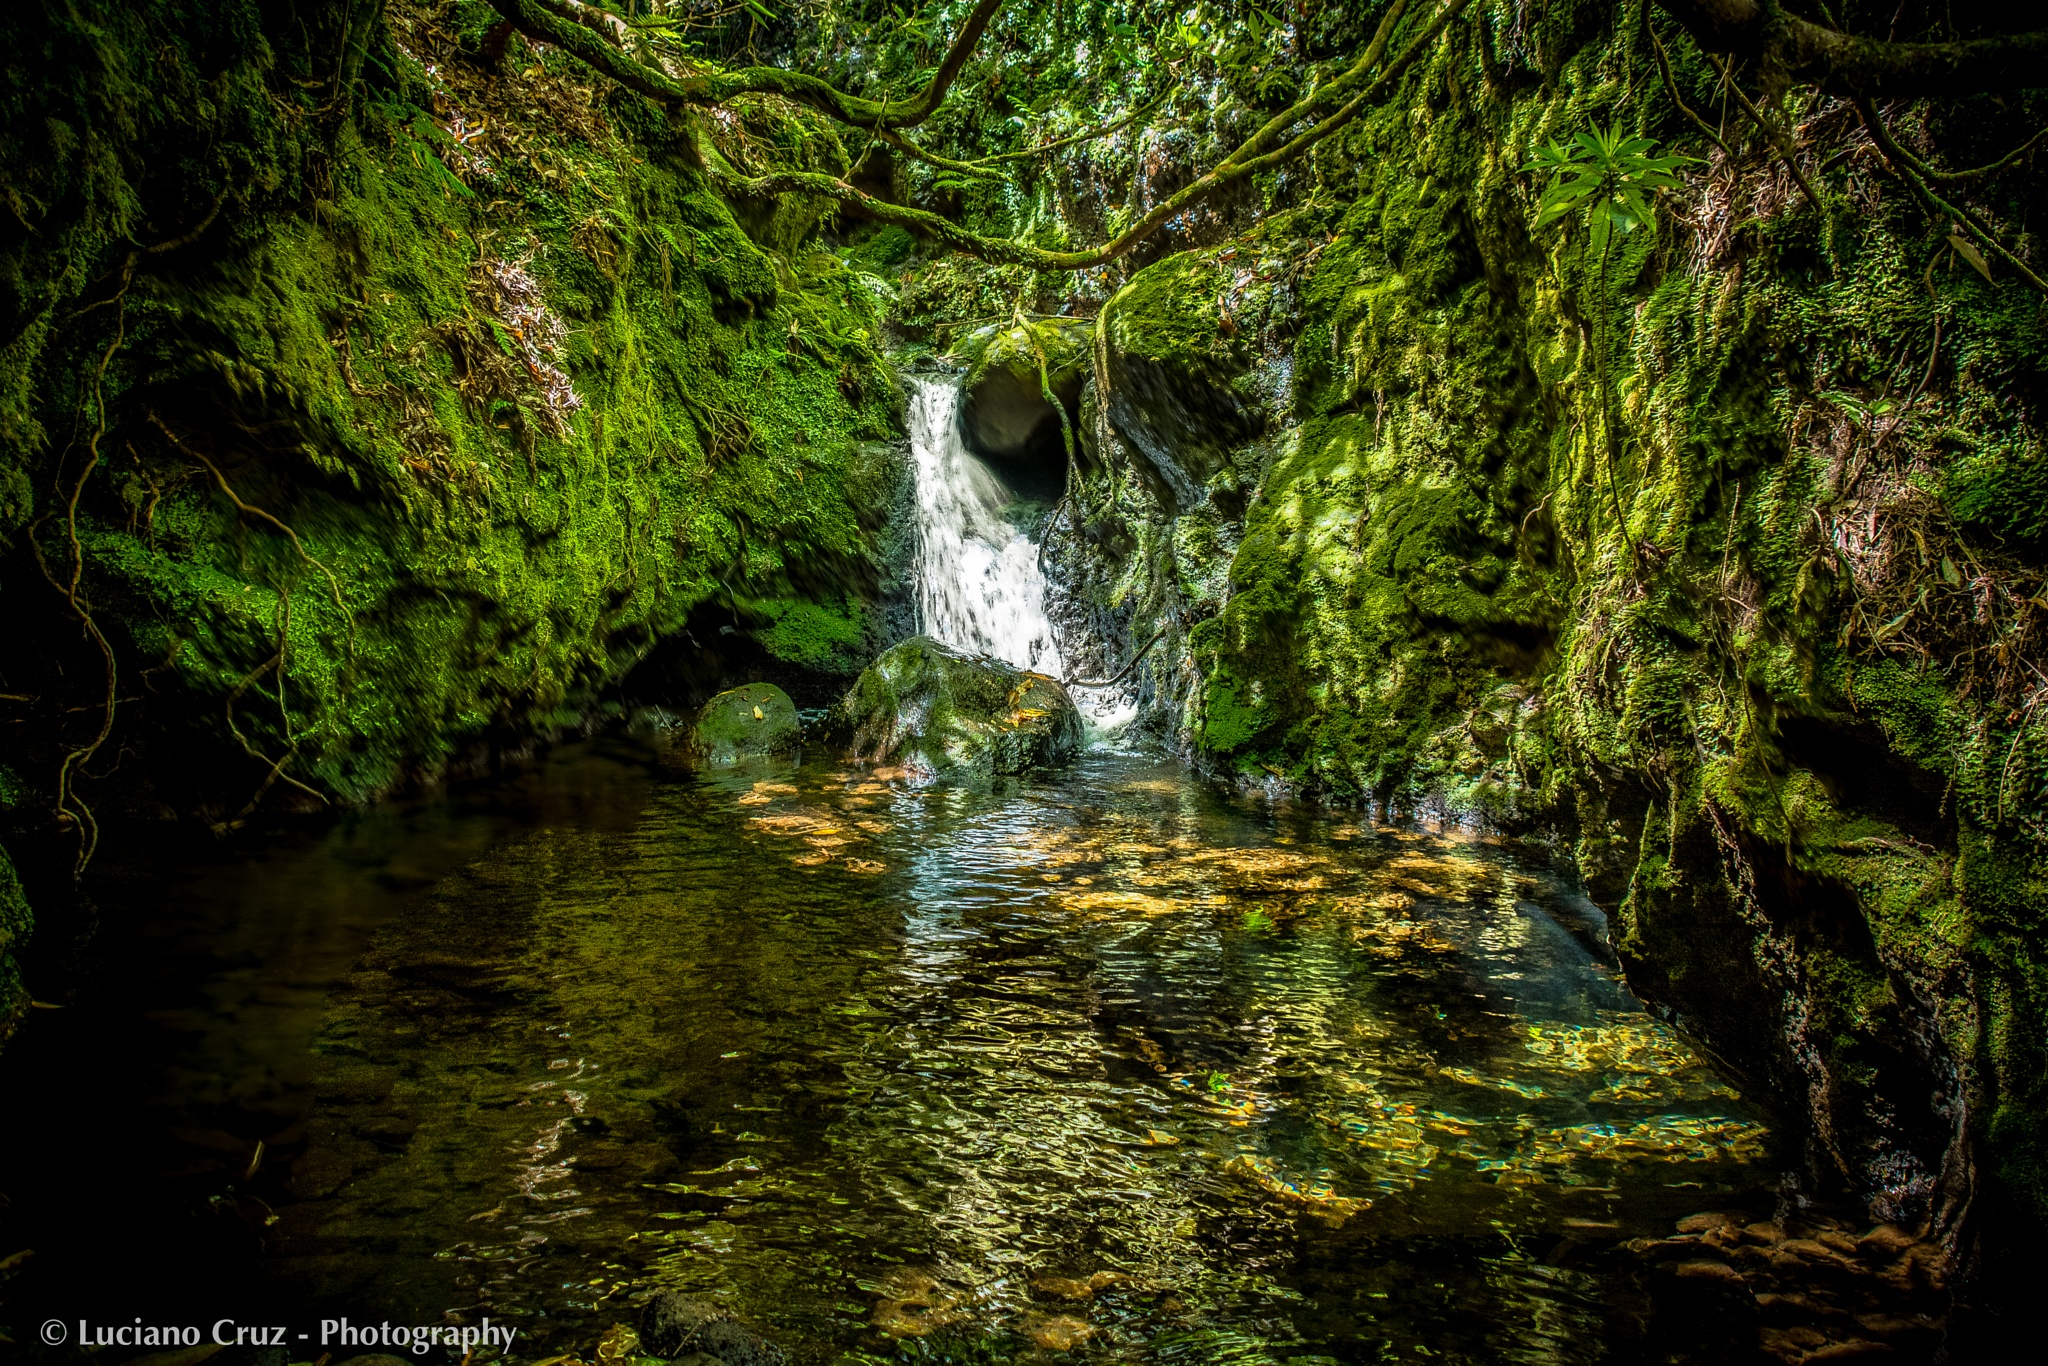 Little Waterfall by Luciano Cruz